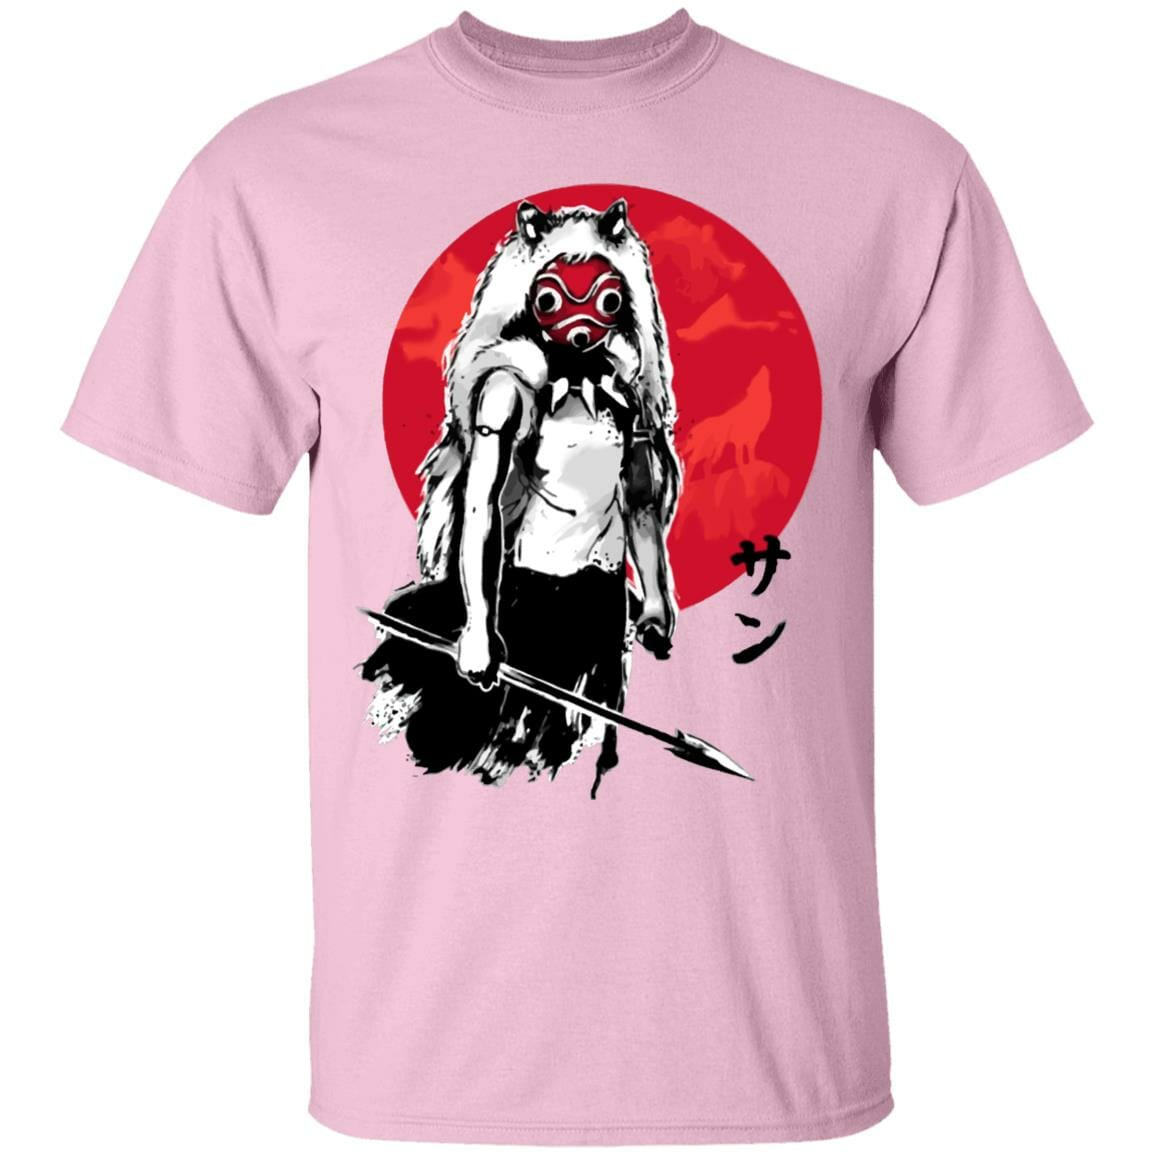 Princess Mononoke T Shirt Unisex